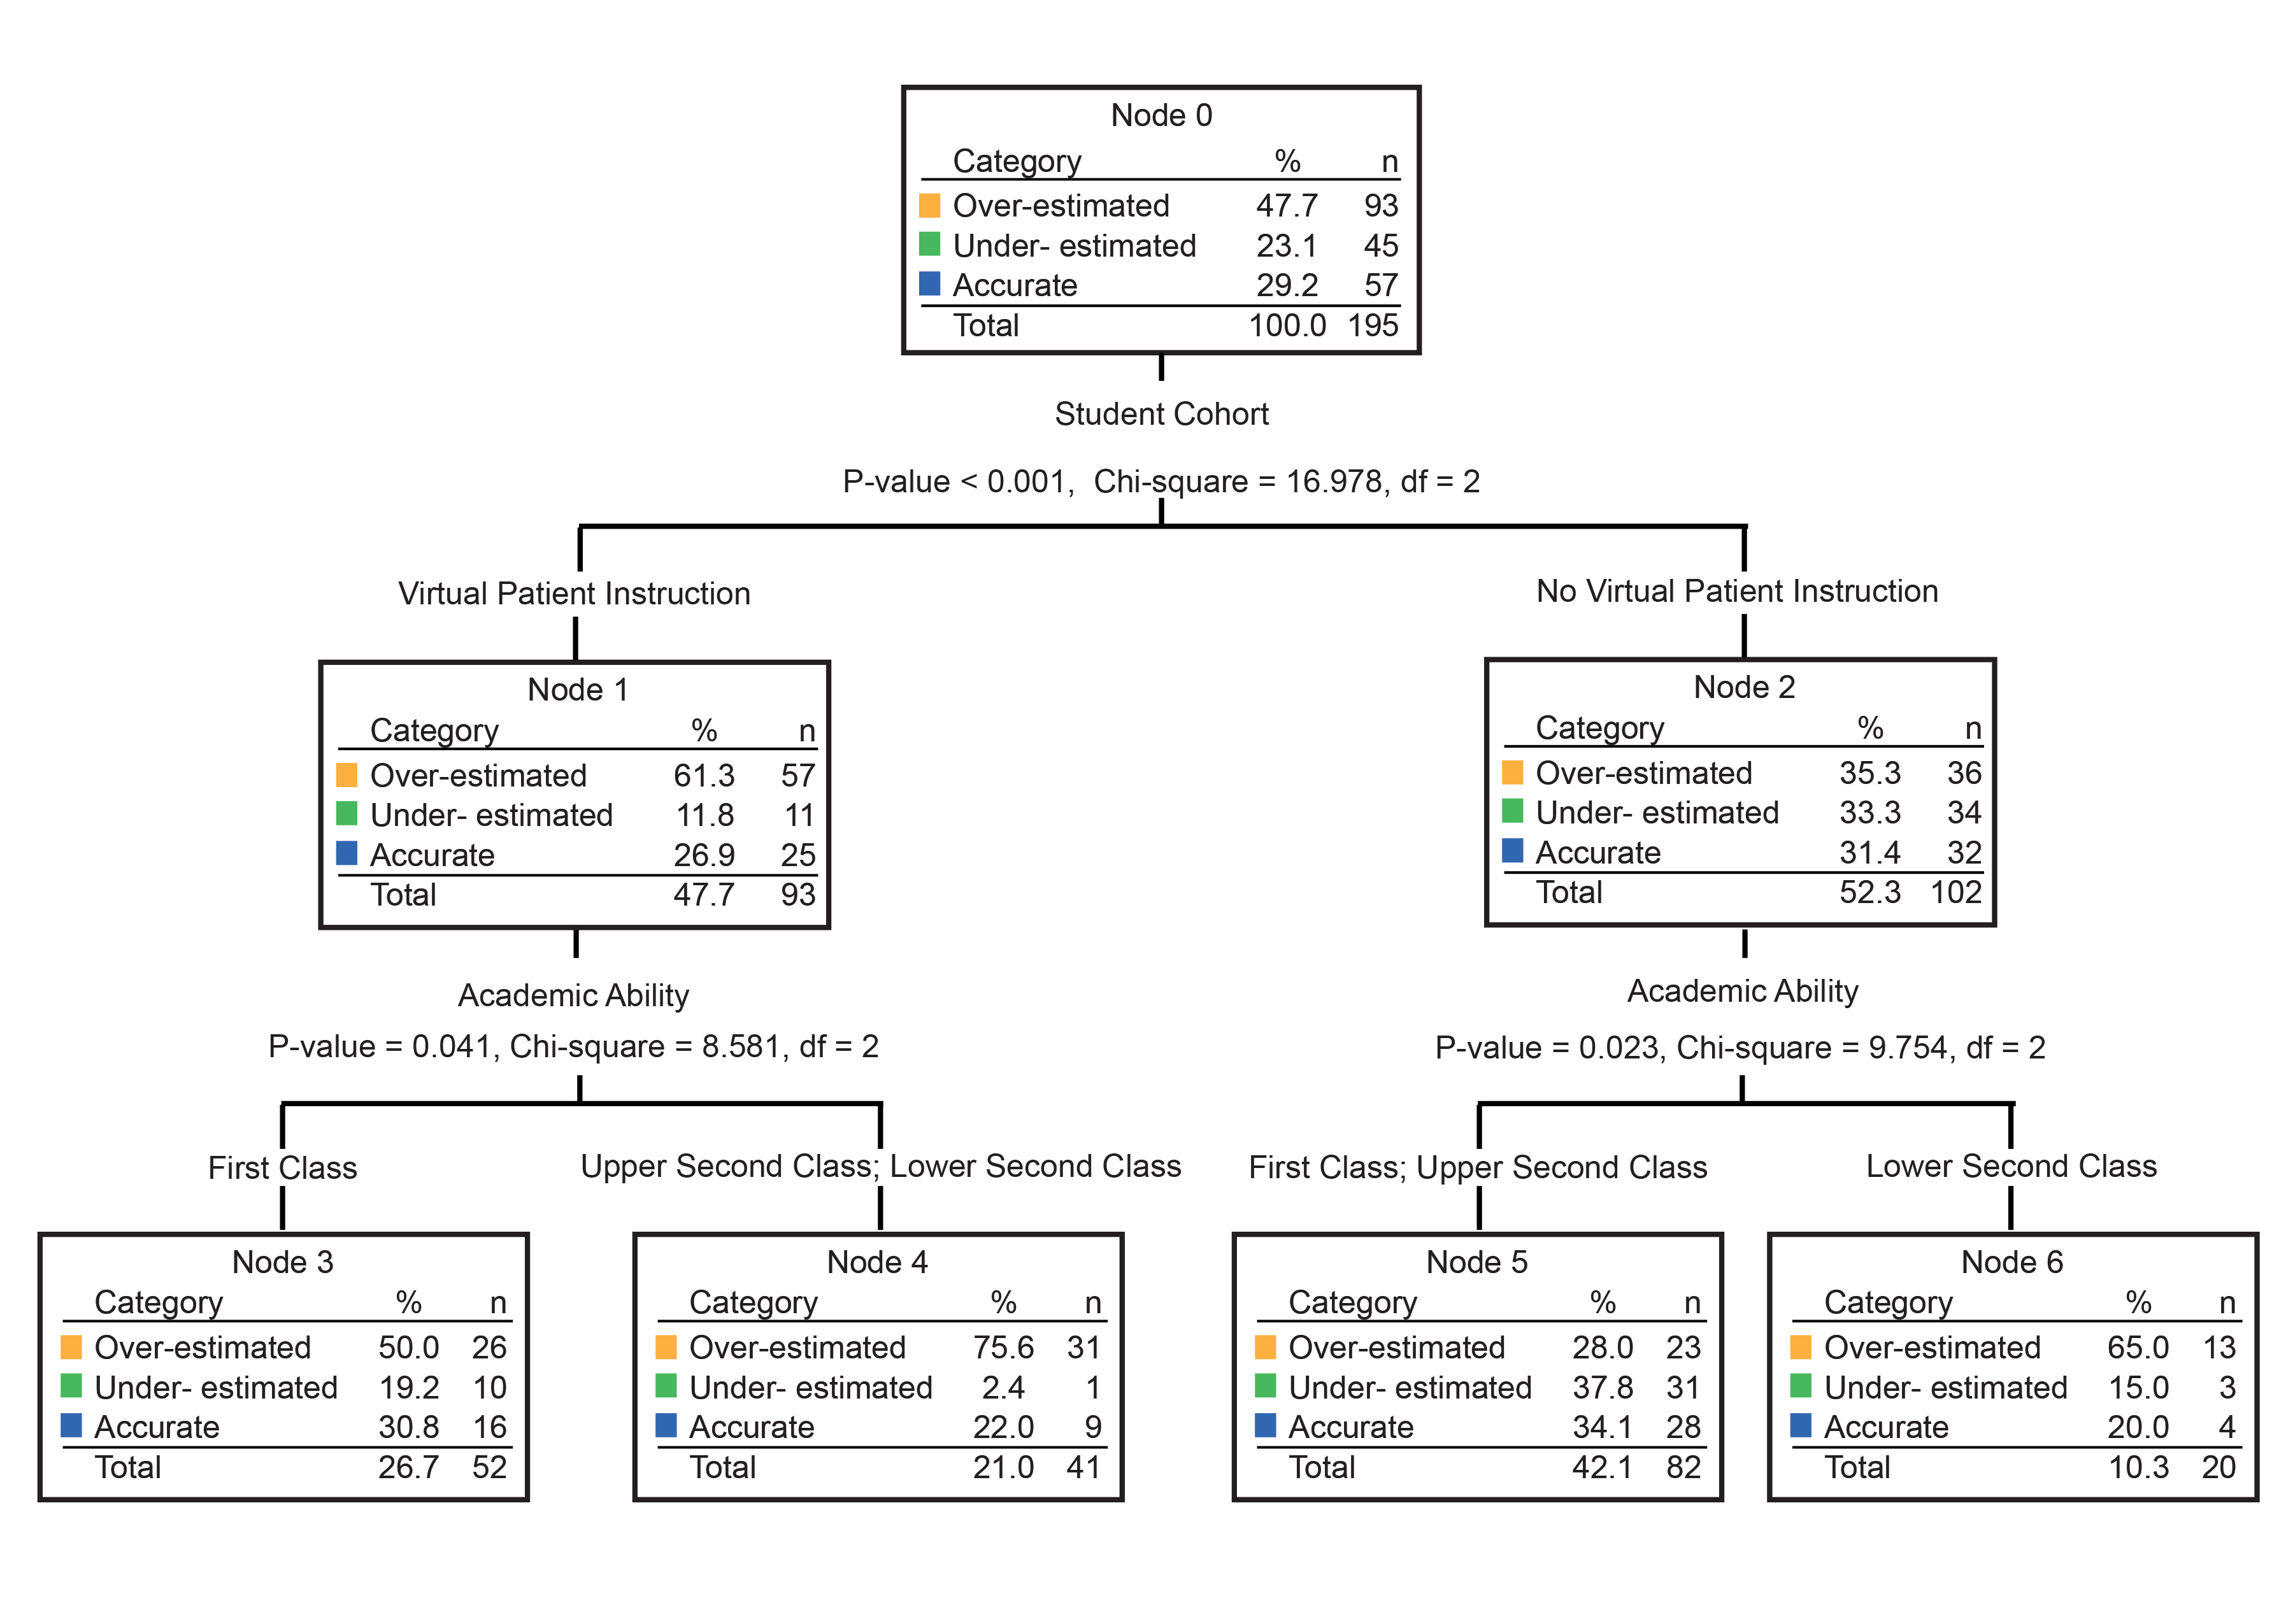 Optometric Education Volume 43 Number 2 Winter Spring 2018 Figure 1 Block Diagram Click On Image To Enlarge